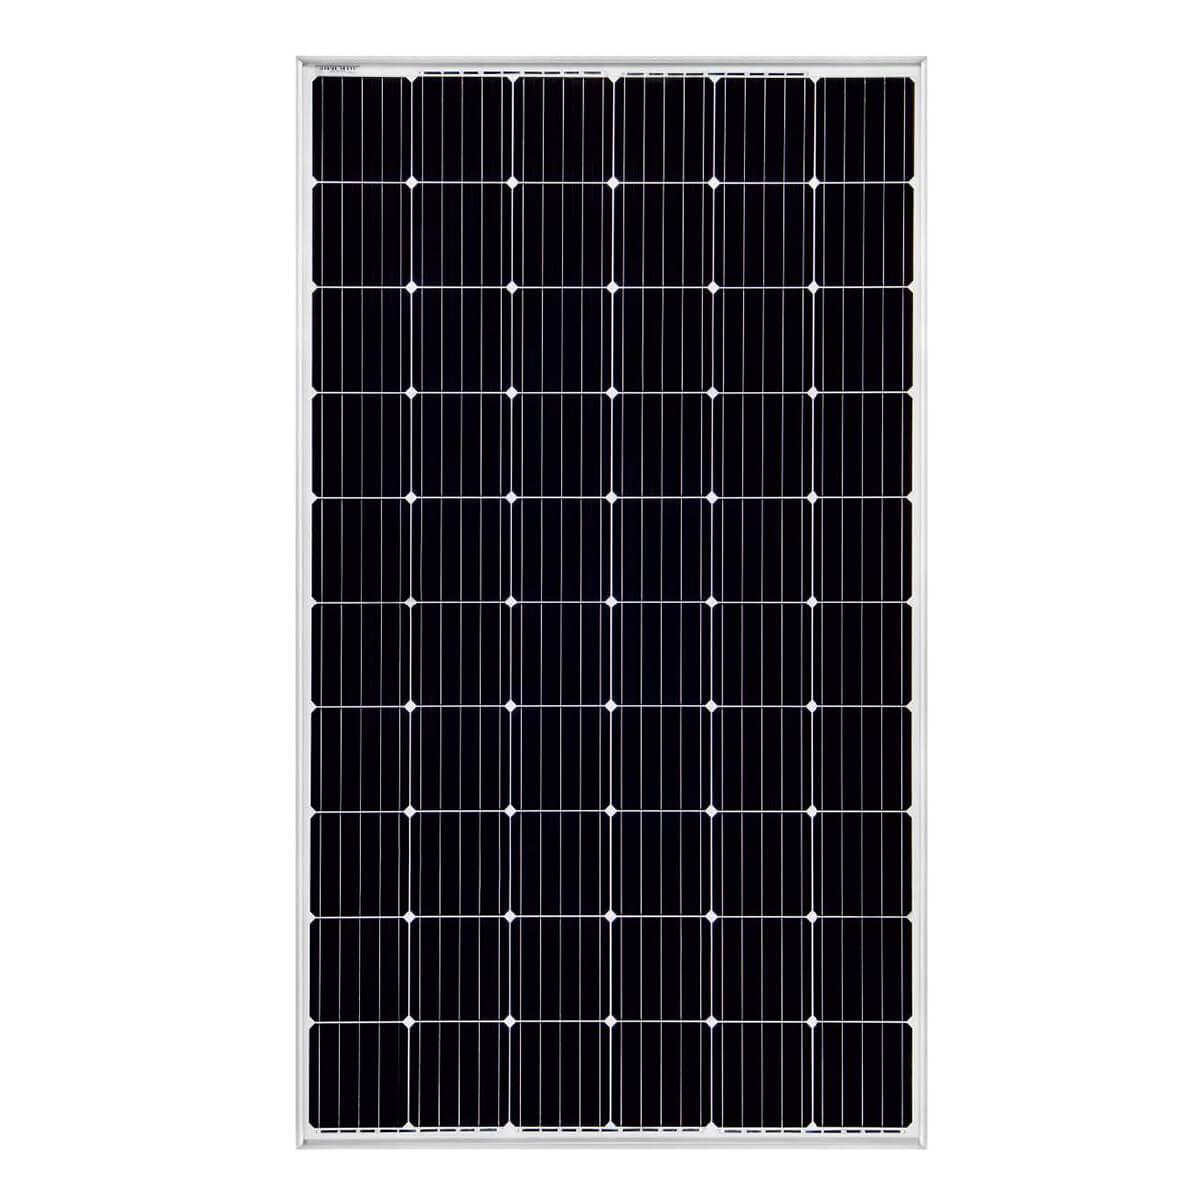 Odul solar 315W panel, odul solar 315Watt panel, Odul solar 315 W panel, odul solar 315 Watt panel, odul solar 315 Watt monokristal panel, Odul solar 315 W watt gunes paneli, odul solar 315 W watt monokristal gunes paneli, odul solar 315 W Watt fotovoltaik monokristal solar panel, odul solar 315W monokristal gunes enerjisi, odul solar OSMp60-315W panel, ÖDÜL SOLAR 315 WATT